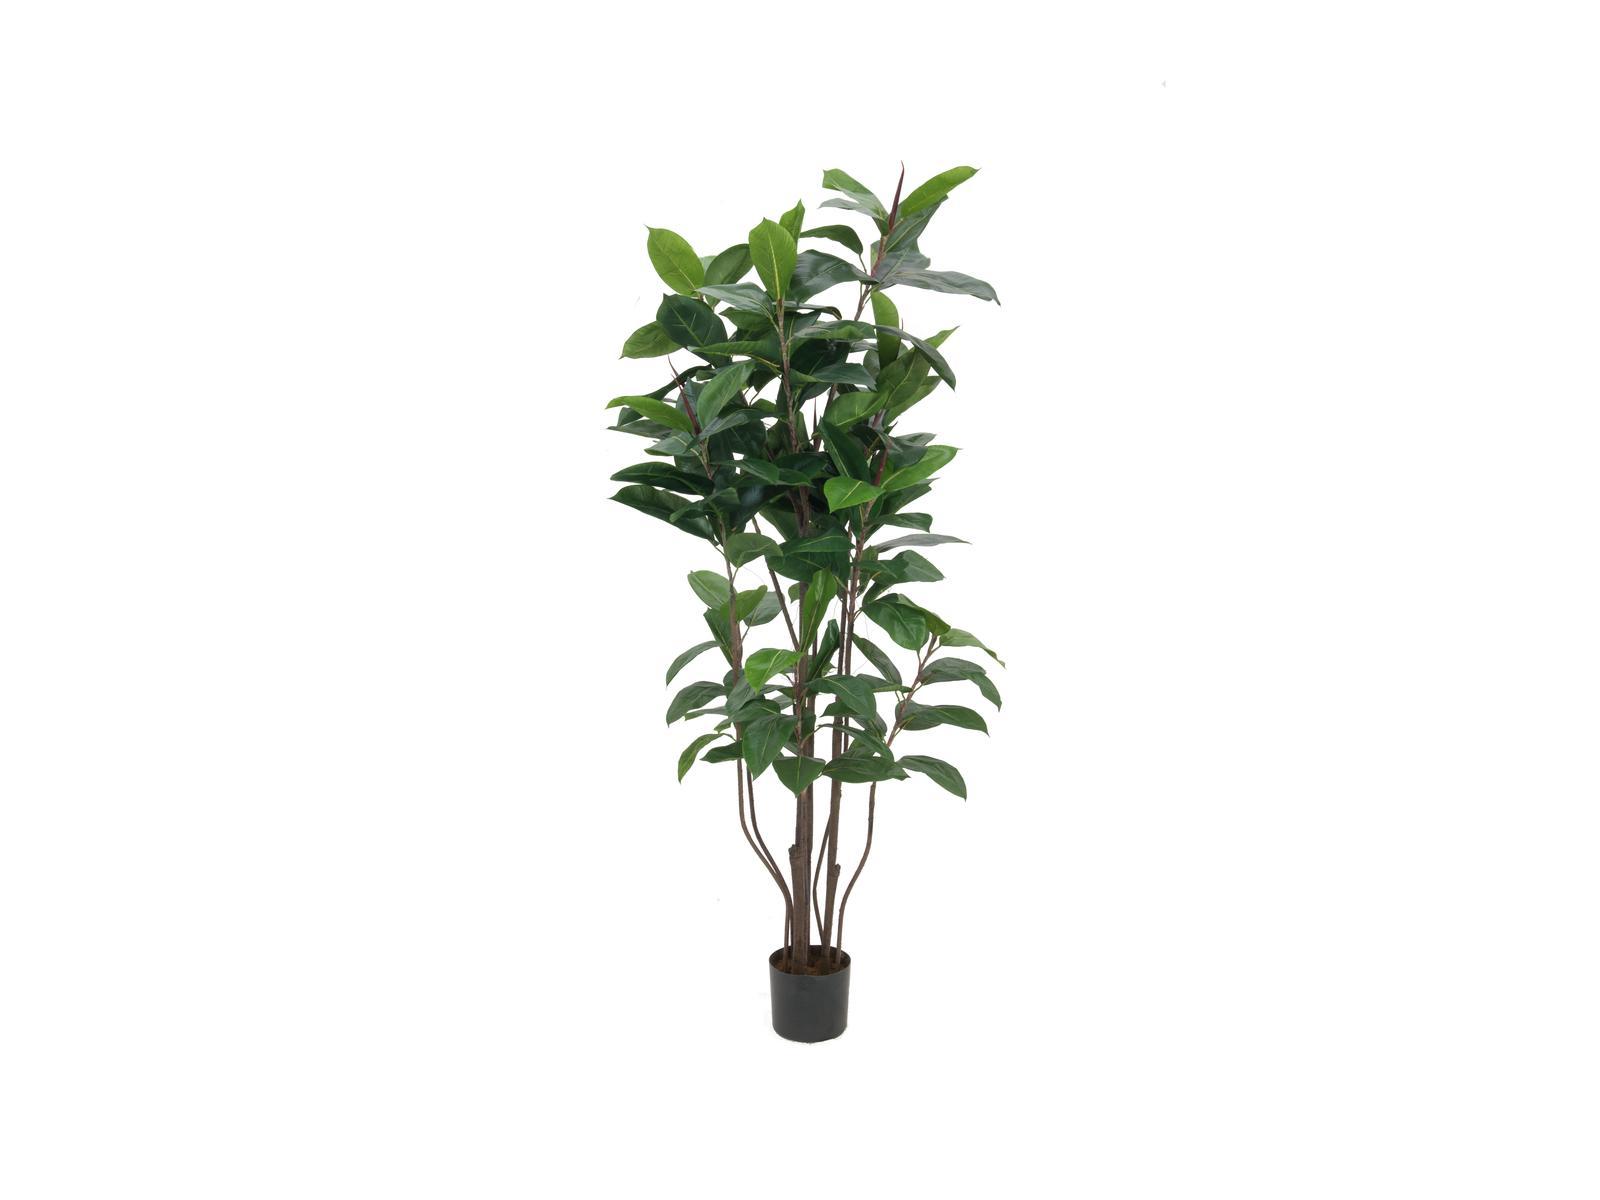 EUROPALMS Gummibaum, Kunstpflanze,150cm